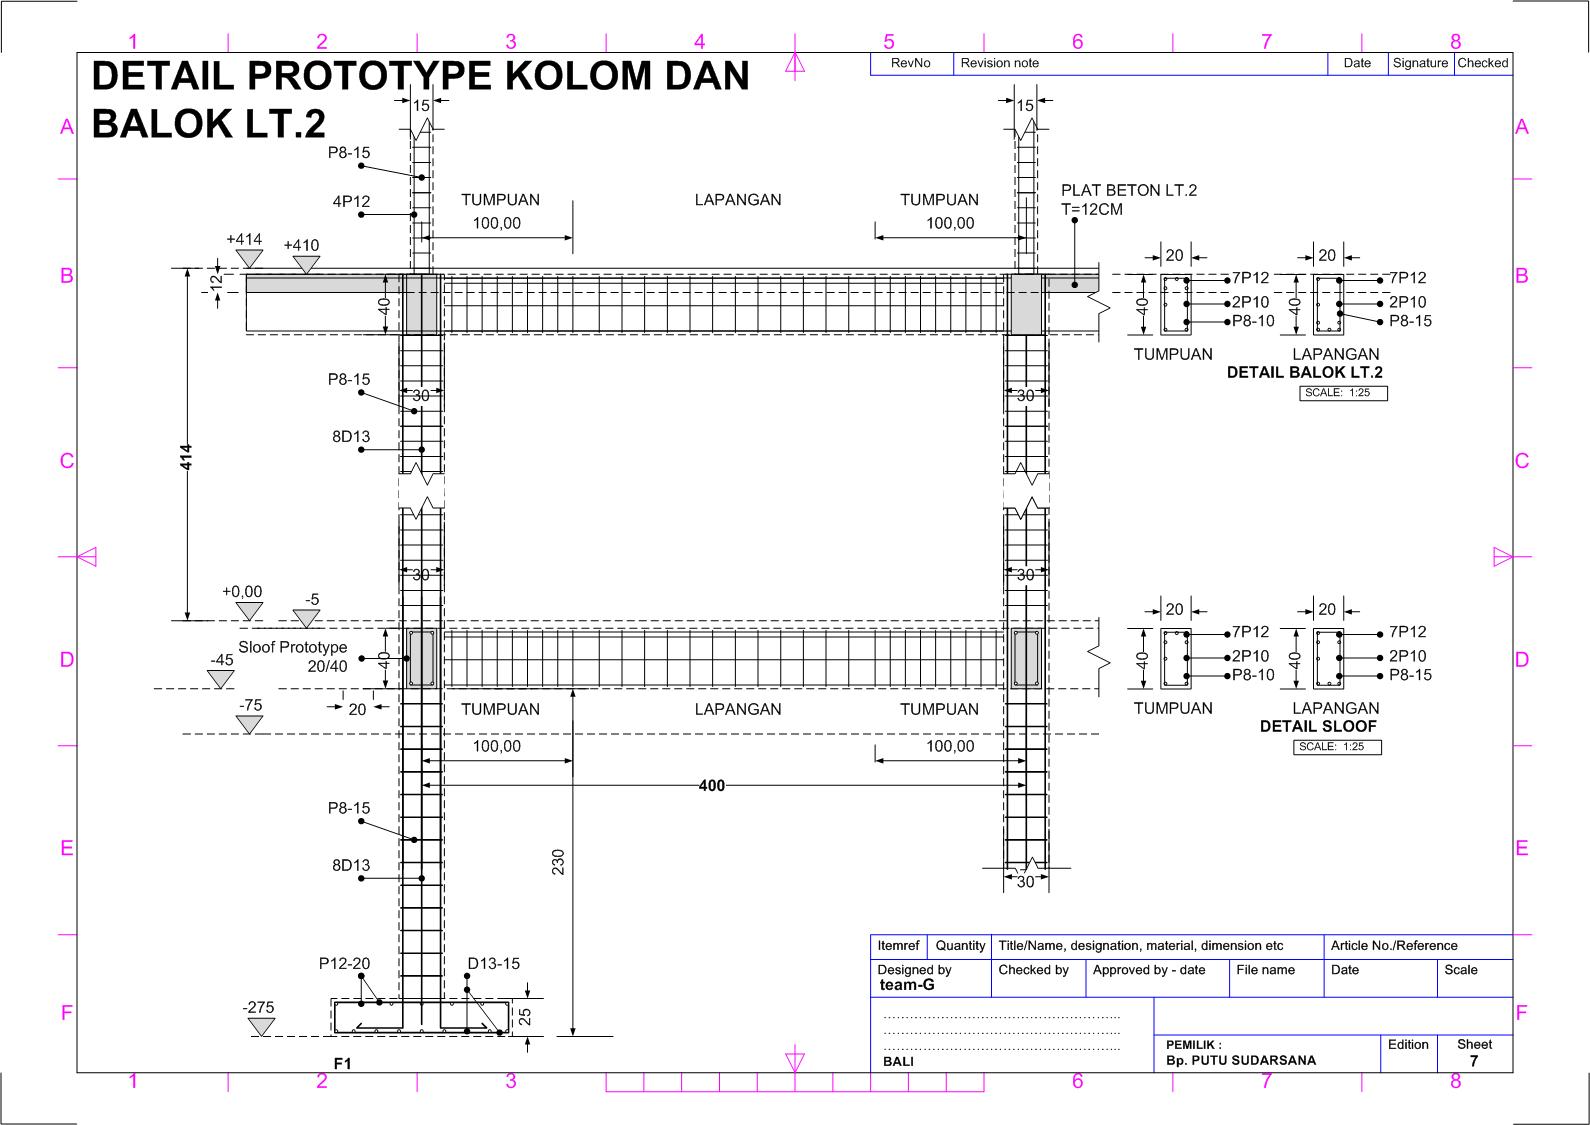 Gambar Kerja Pondasi 7 Detail Prototype Kolom Balok Lantai 2 Teknik Sipil Denah Lantai Rumah Denah Lantai